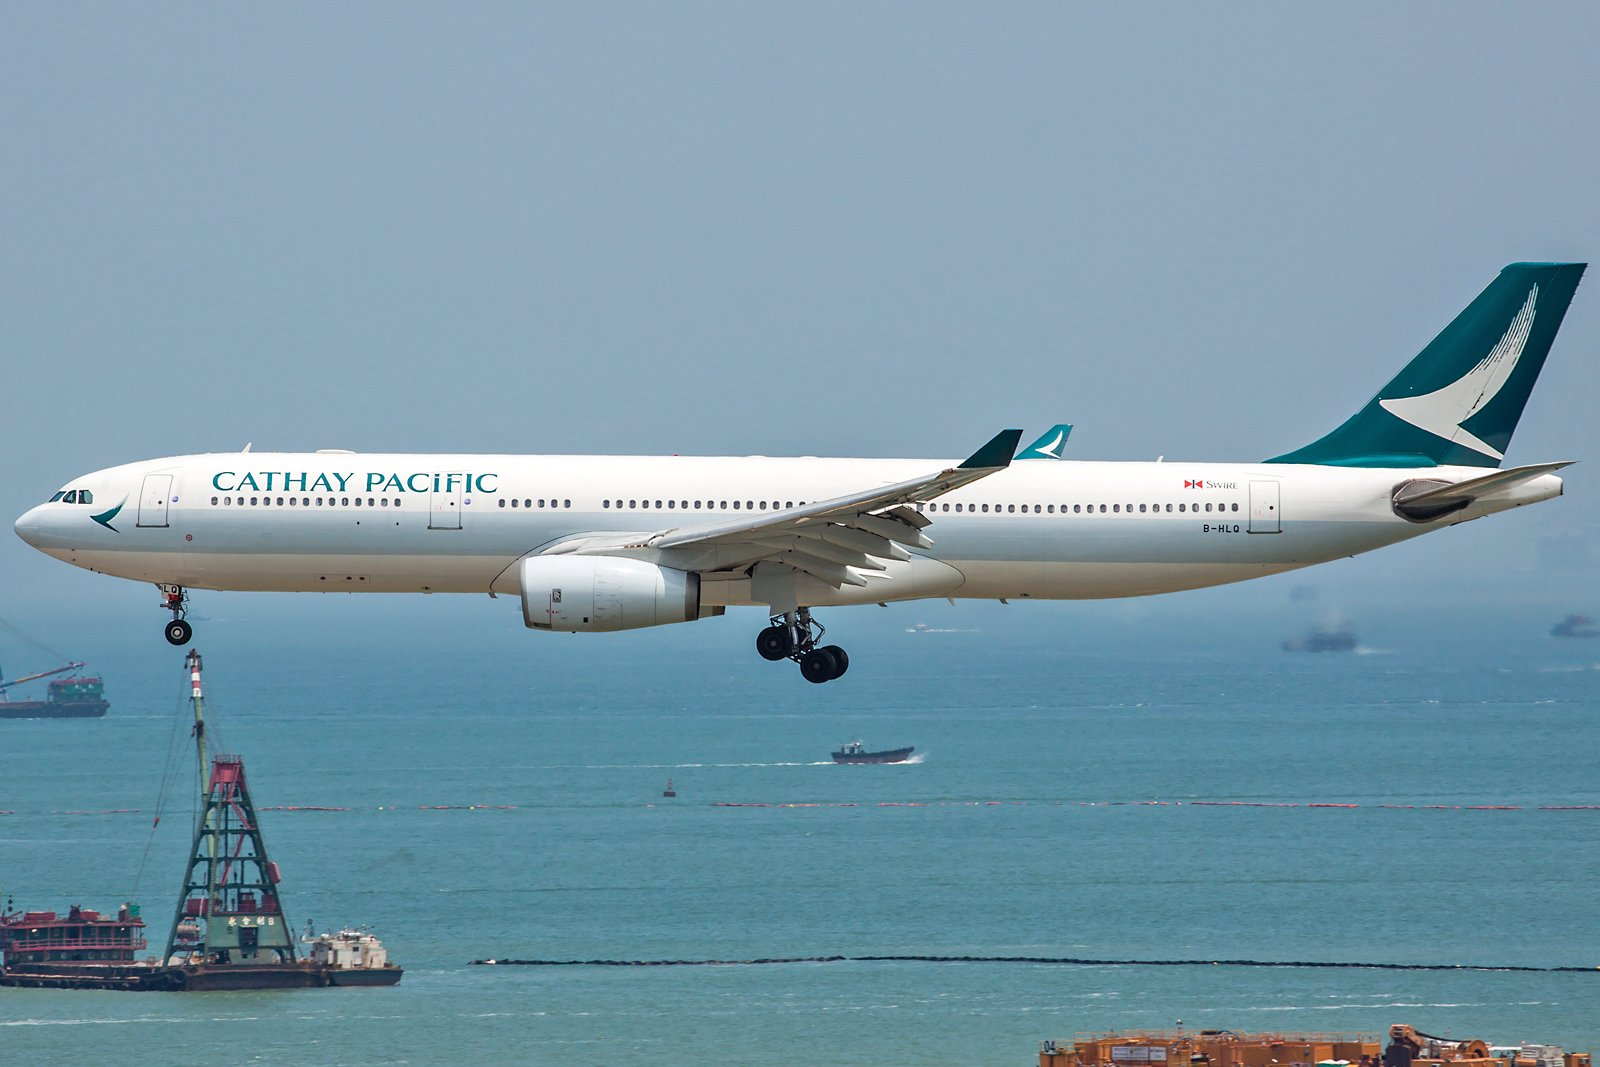 Cathay Pacific Airbus A330-343 B-HLQ